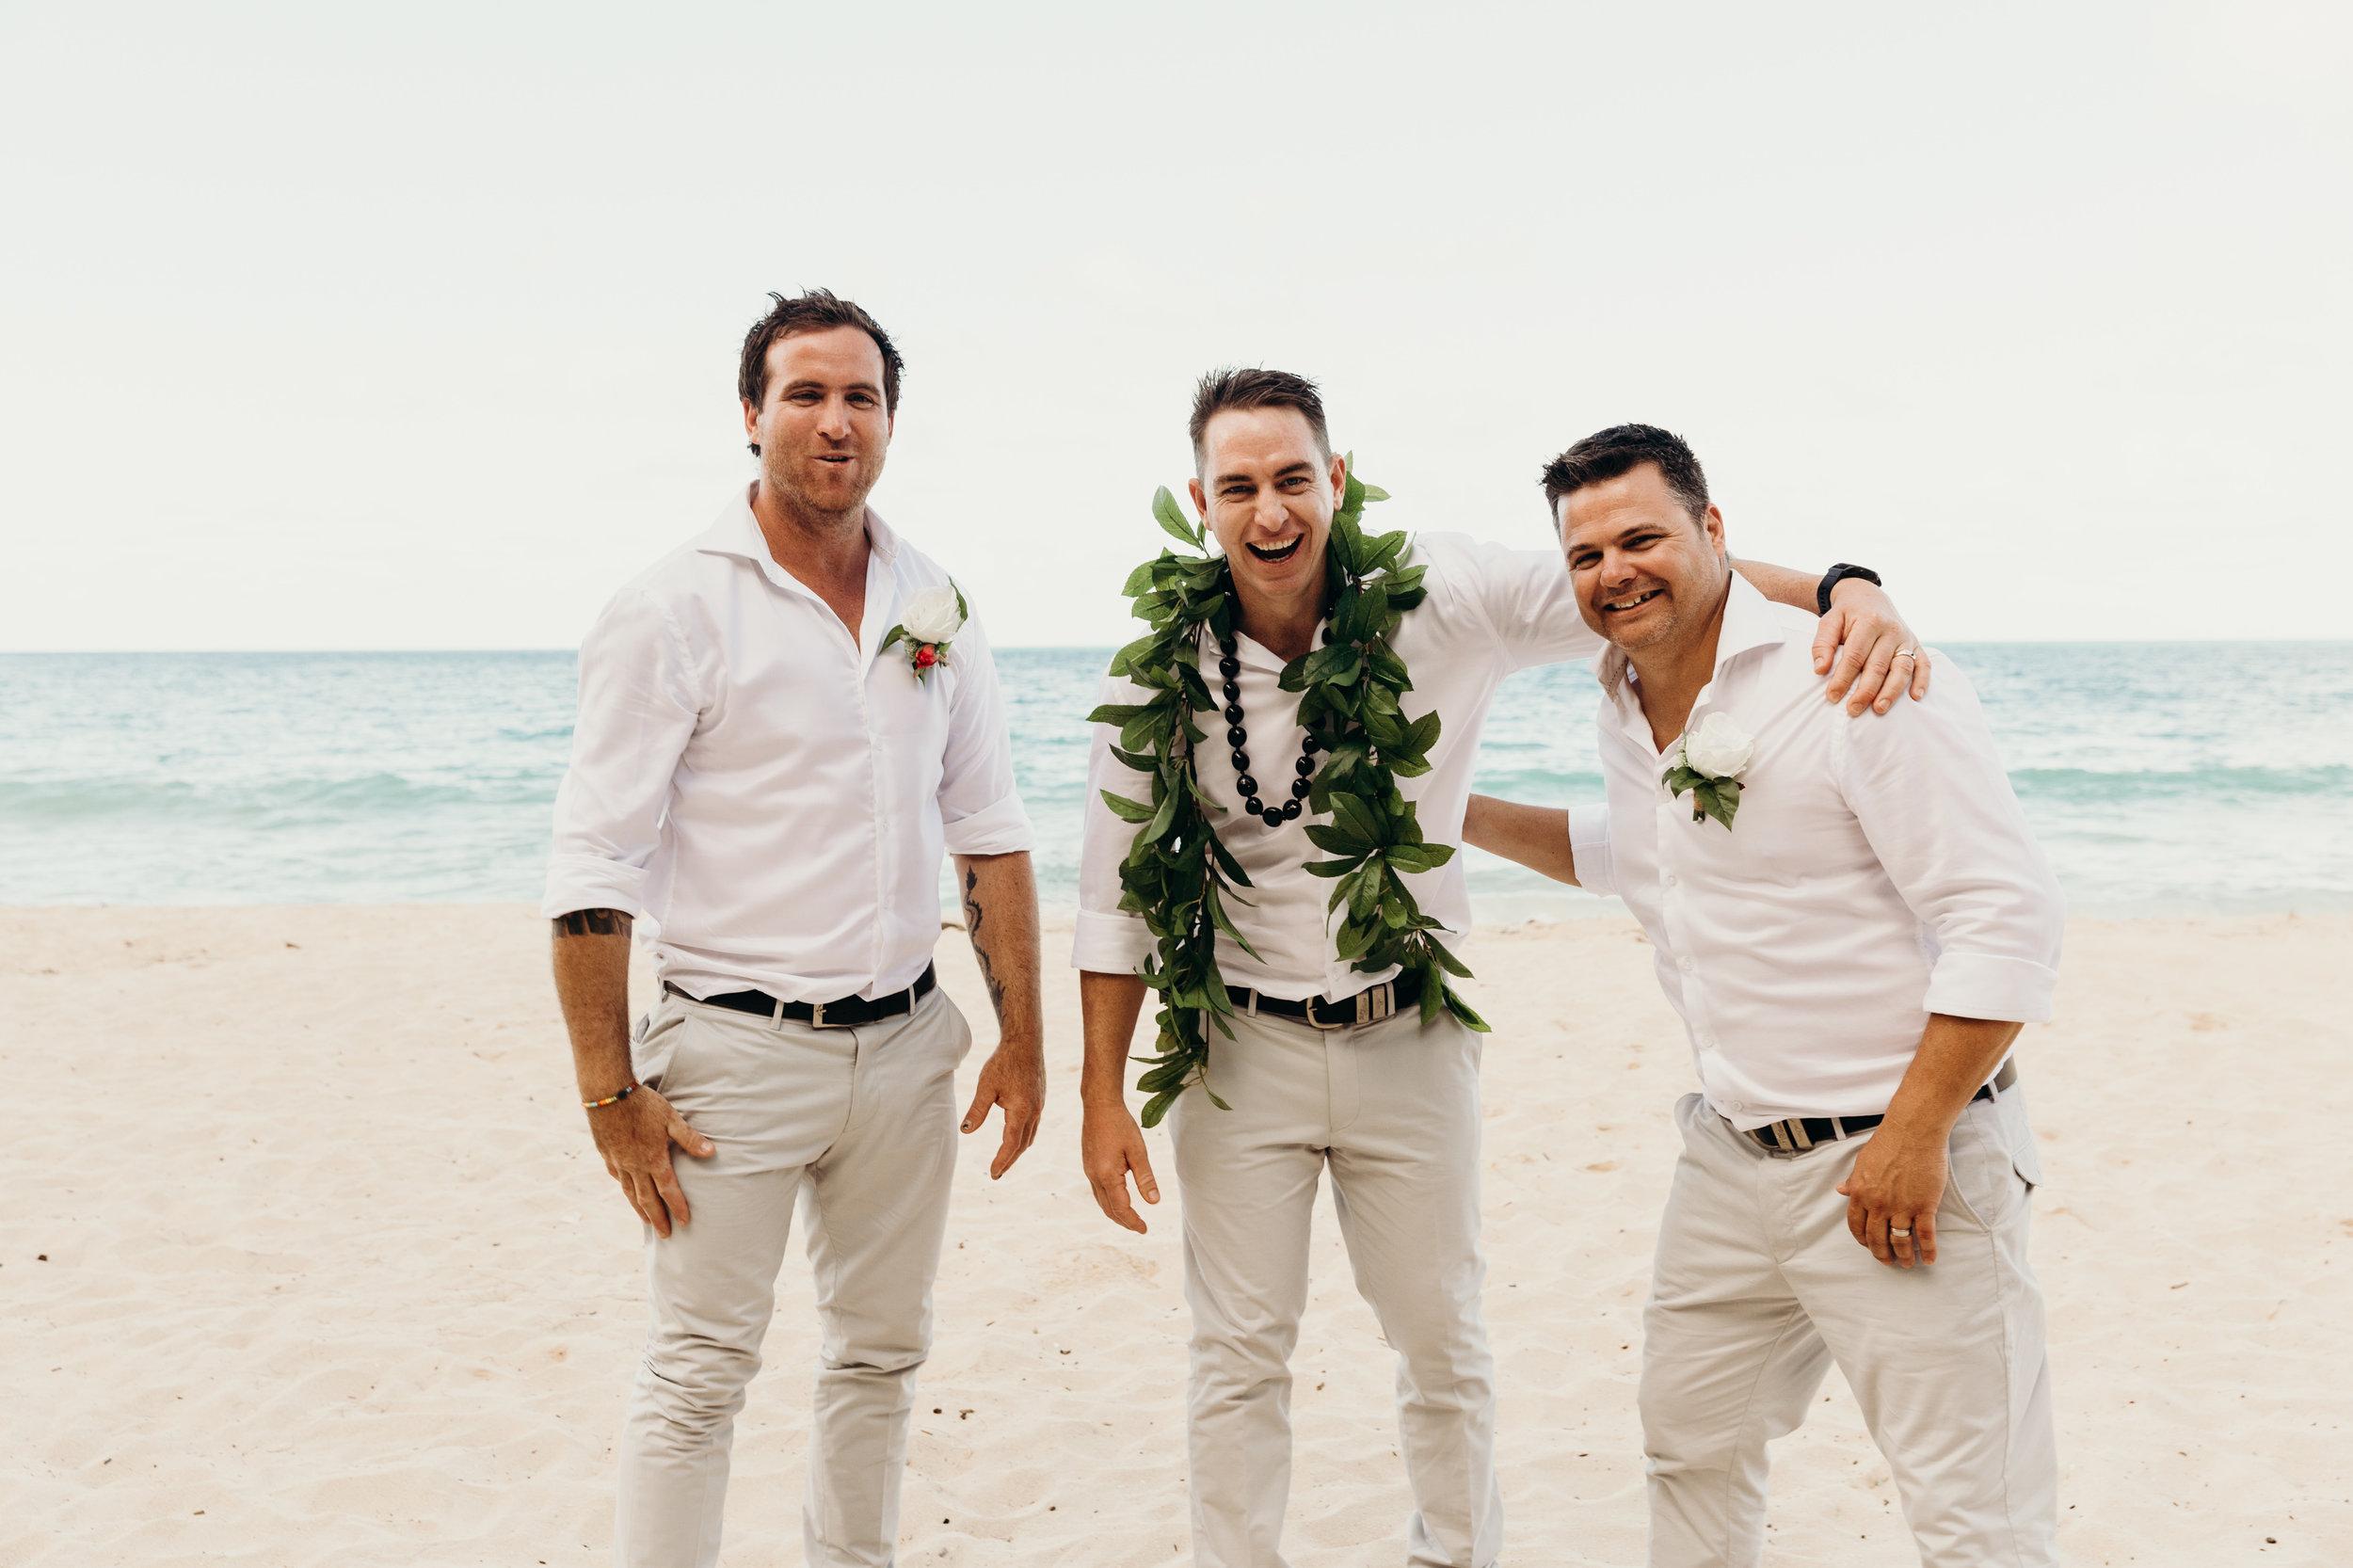 HAWAII-WEDDING-PHOTOGRAPHER-ALOHILANI-RESORT-KEANI-BAKULA-45.jpg